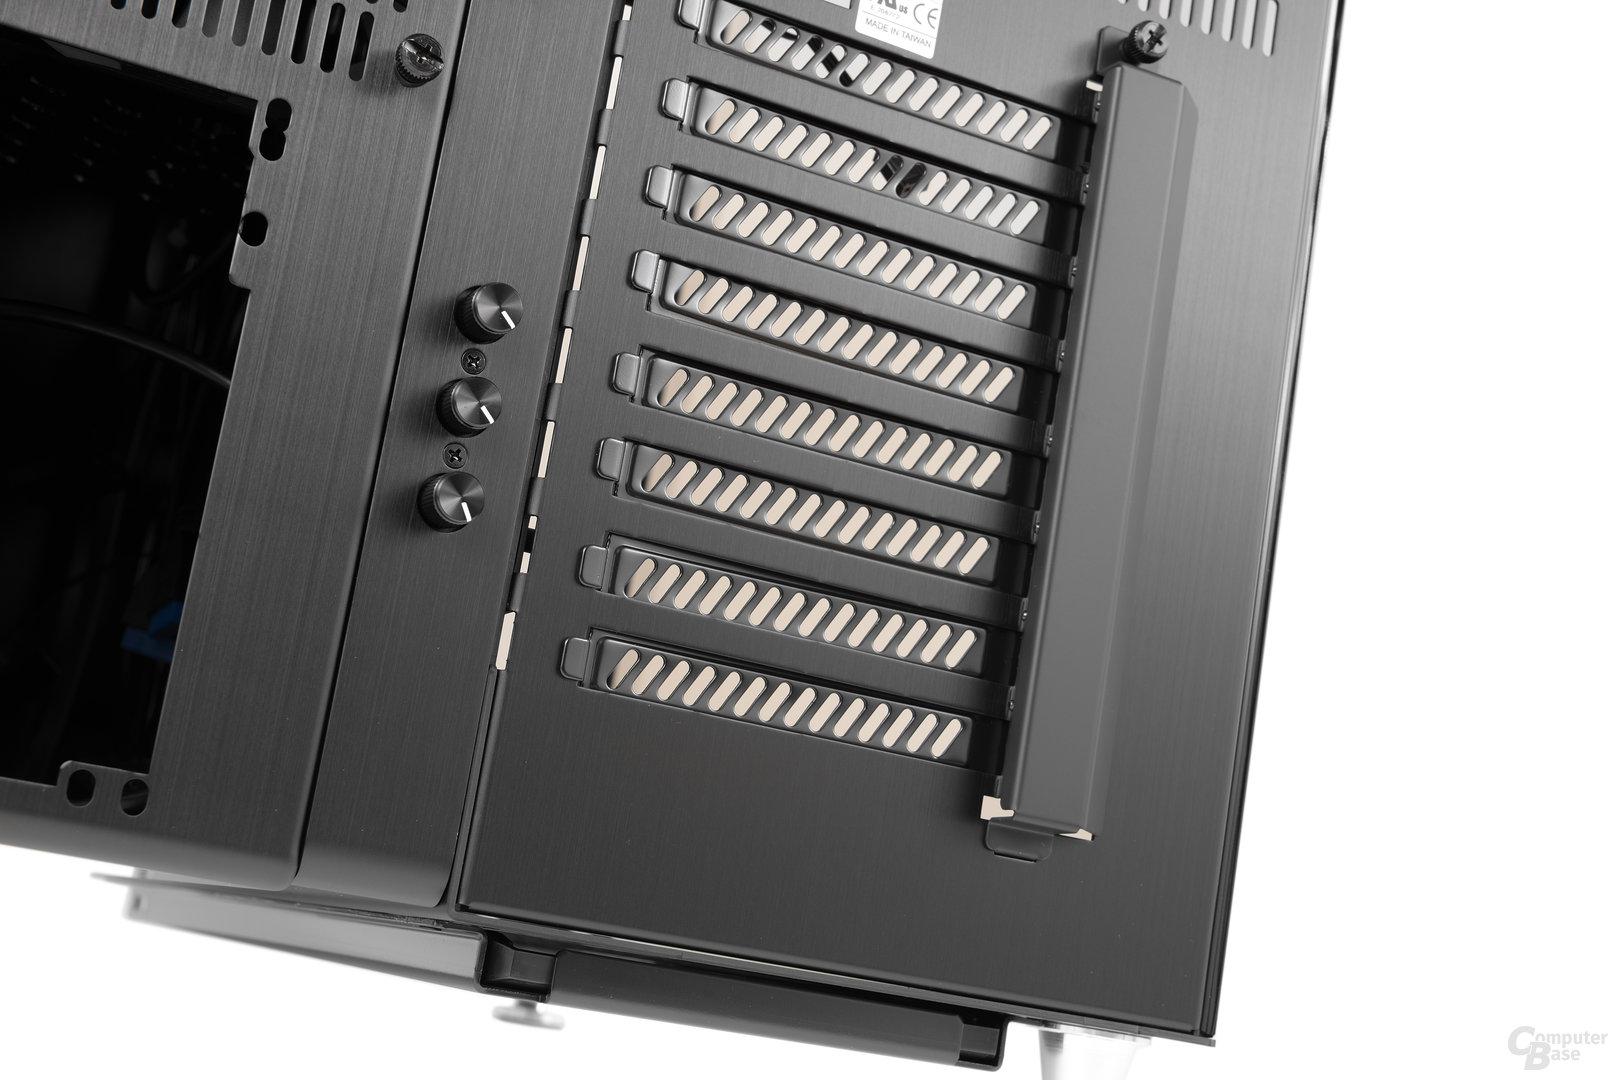 Lian Li PC-O9 – RGB-LED-Steuerung